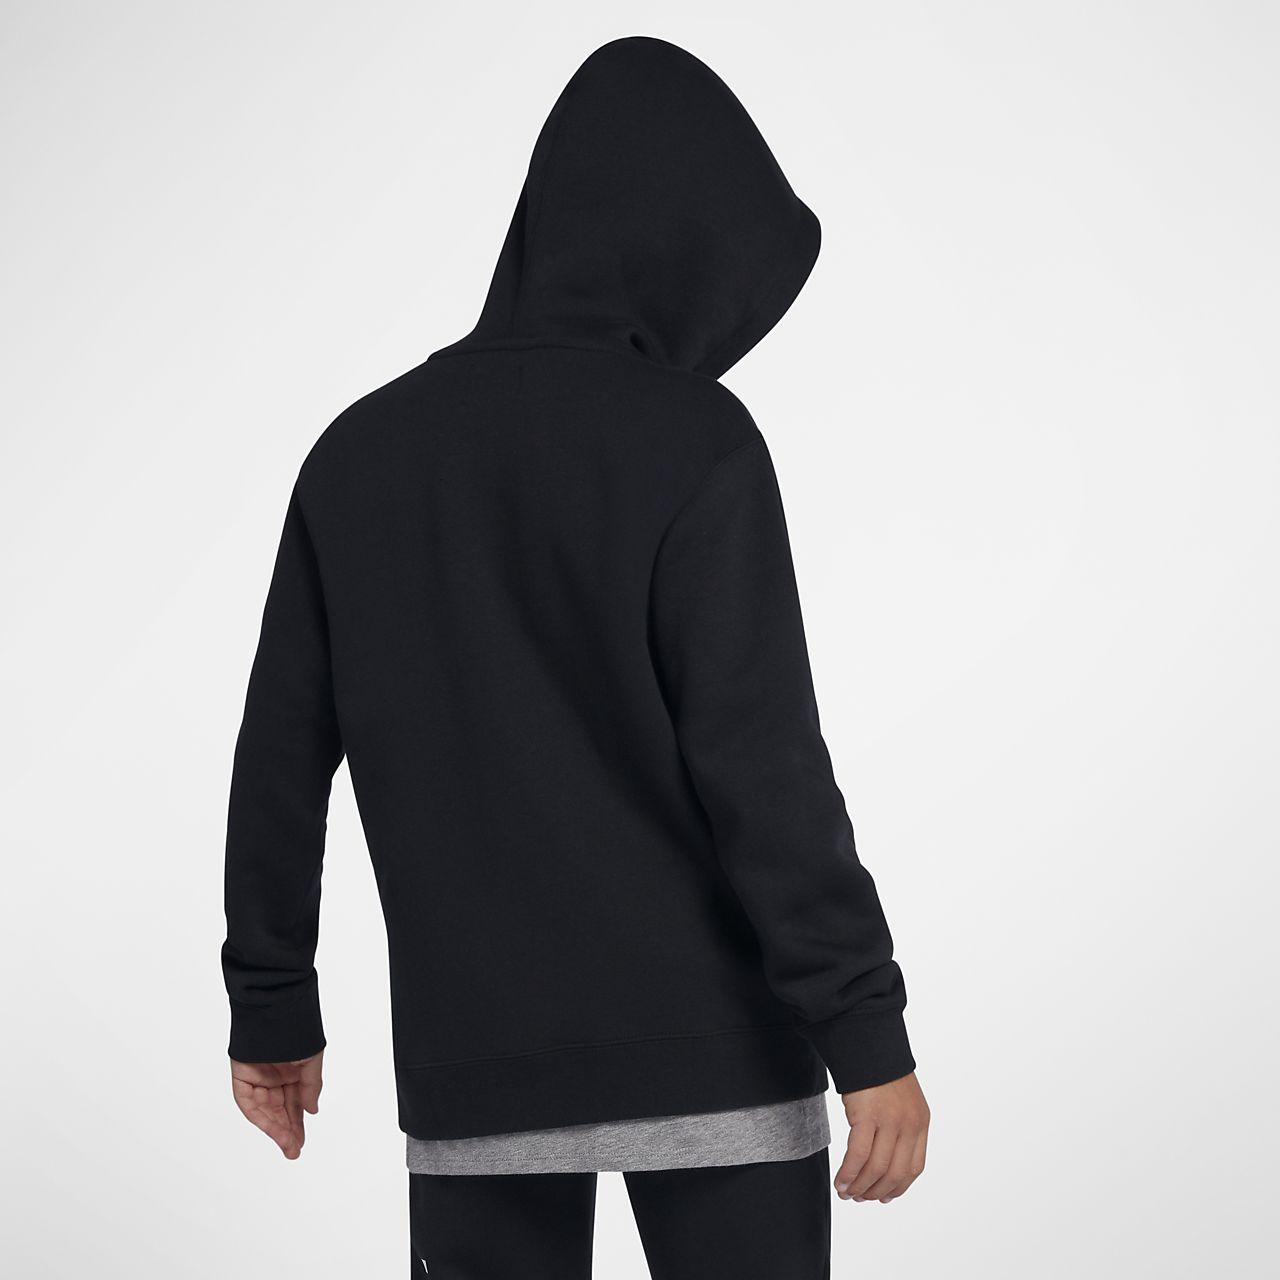 75aefd3e249 ... Αγορίστικη μπλούζα με κουκούλα και φερμουάρ Hurley Surf Check Rip